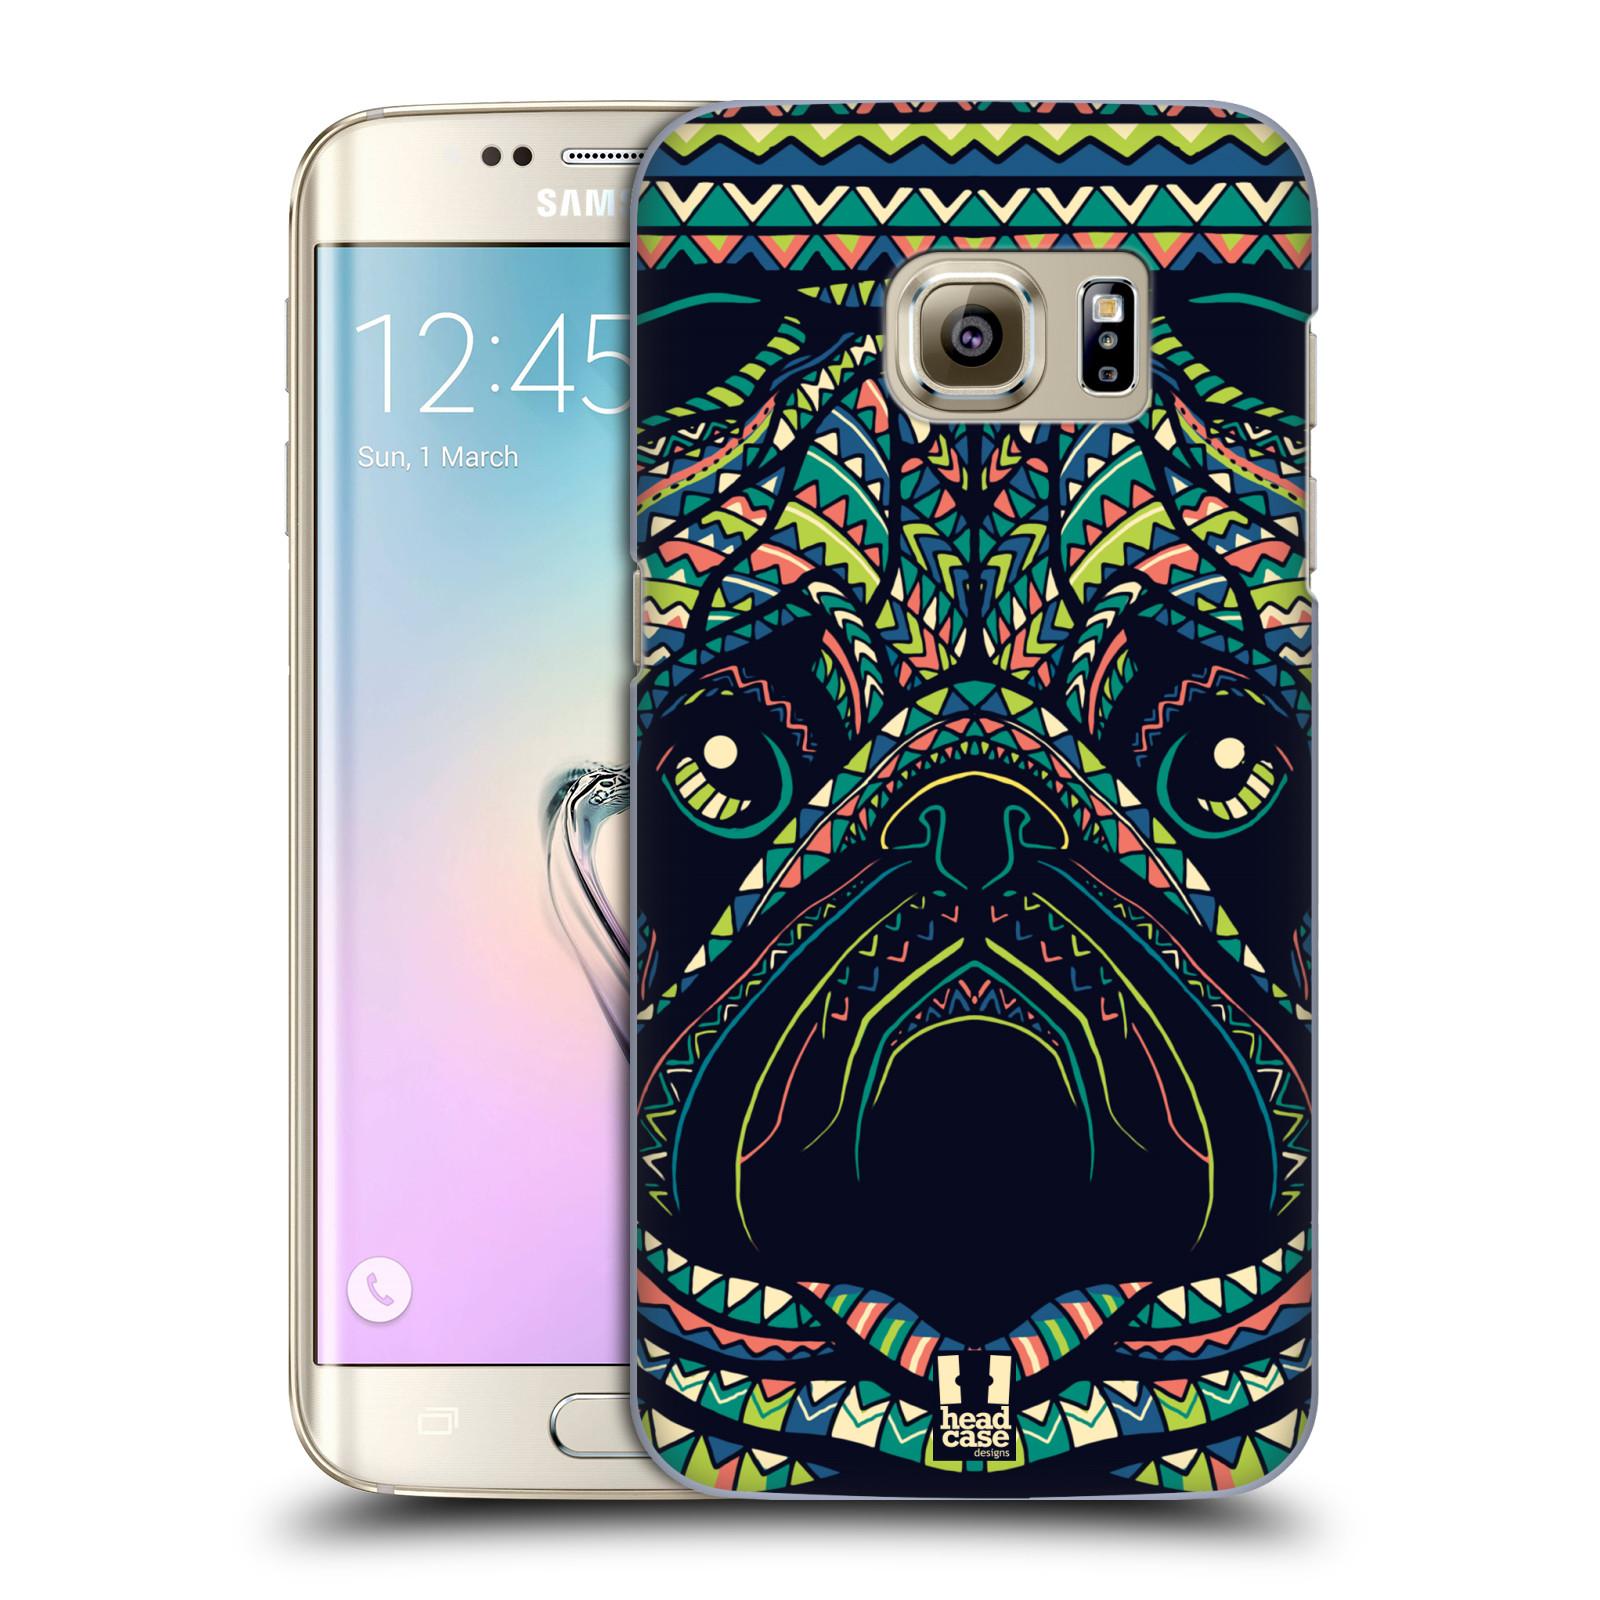 HEAD CASE plastový obal na mobil SAMSUNG GALAXY S7 EDGE vzor Aztécký motiv zvíře 3 mopsík